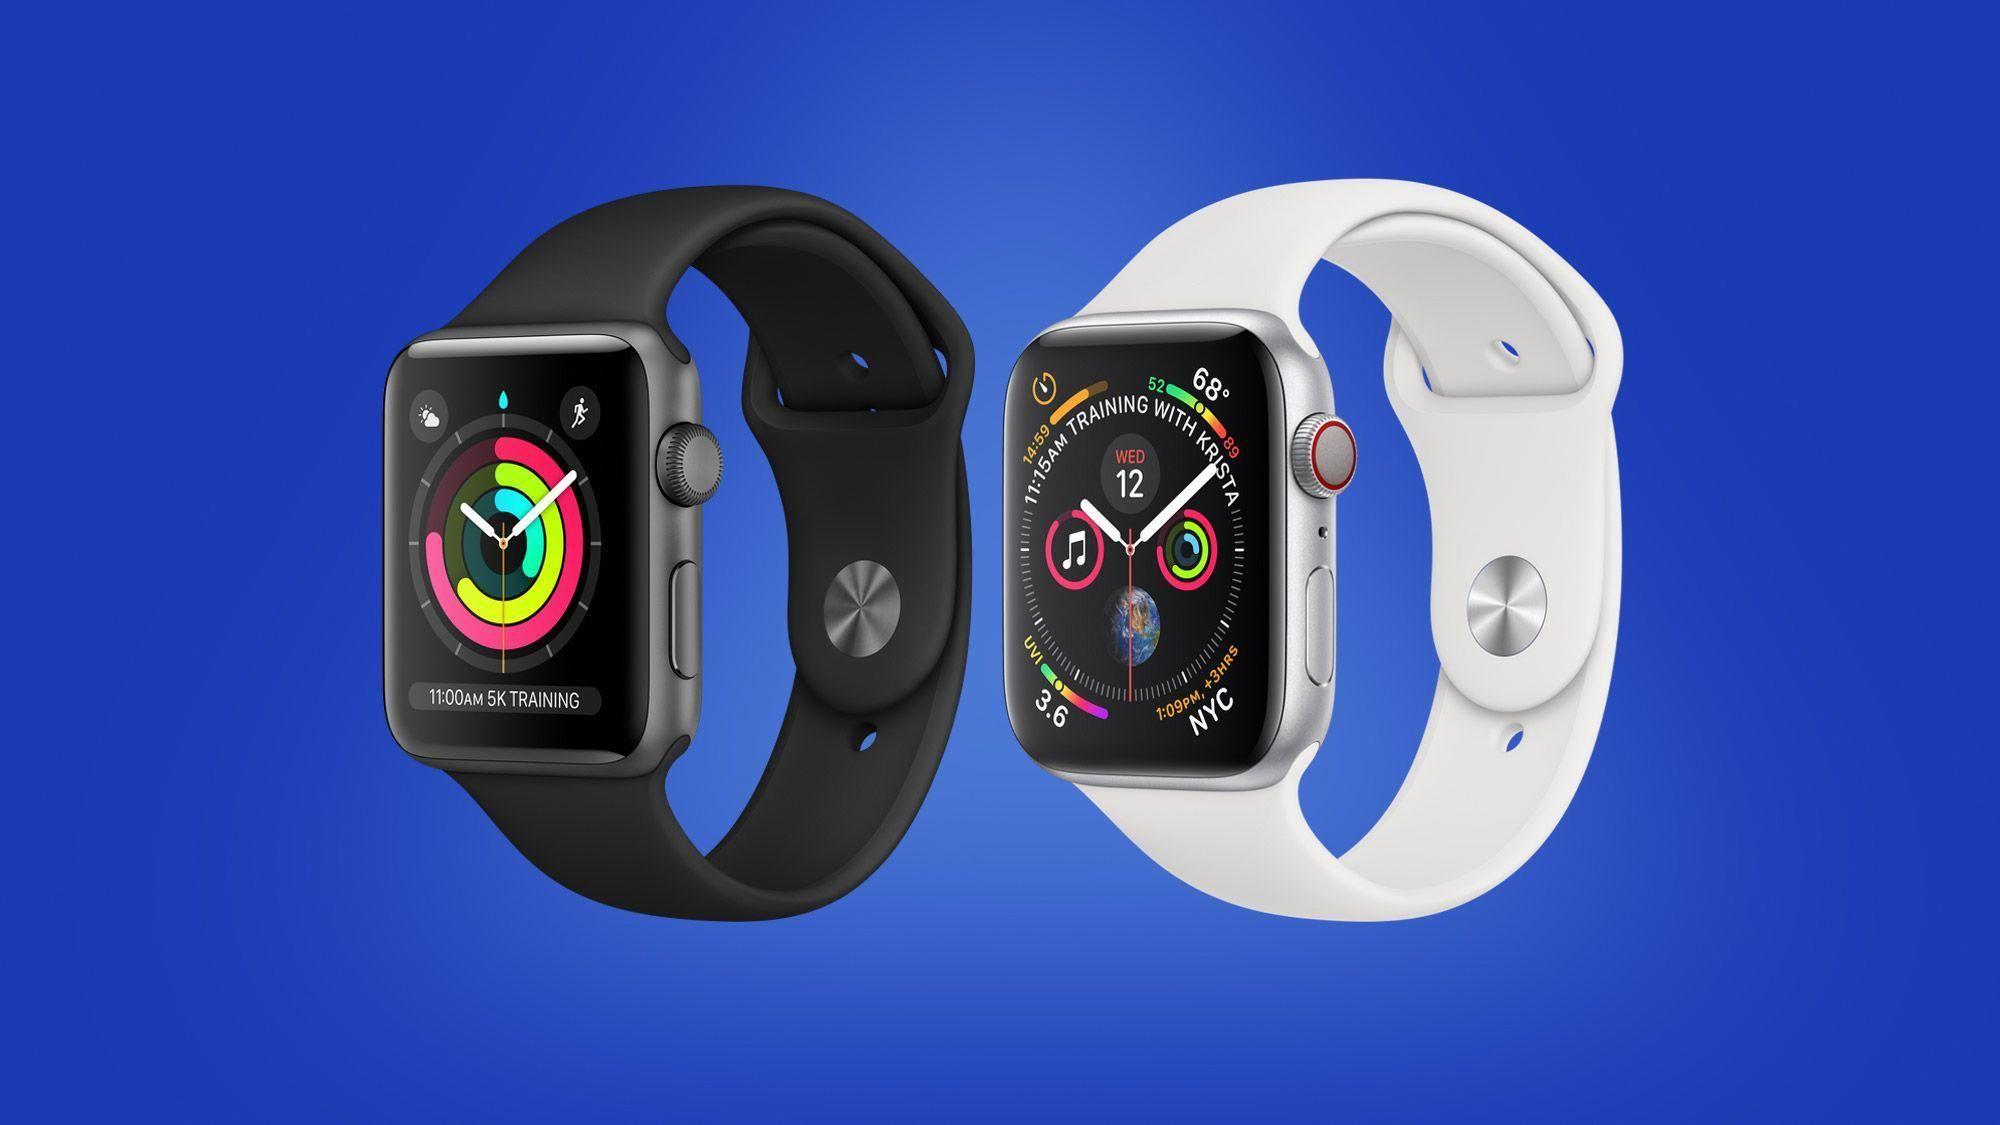 Apple Watch sale at Walmart preBlack Friday deals on the